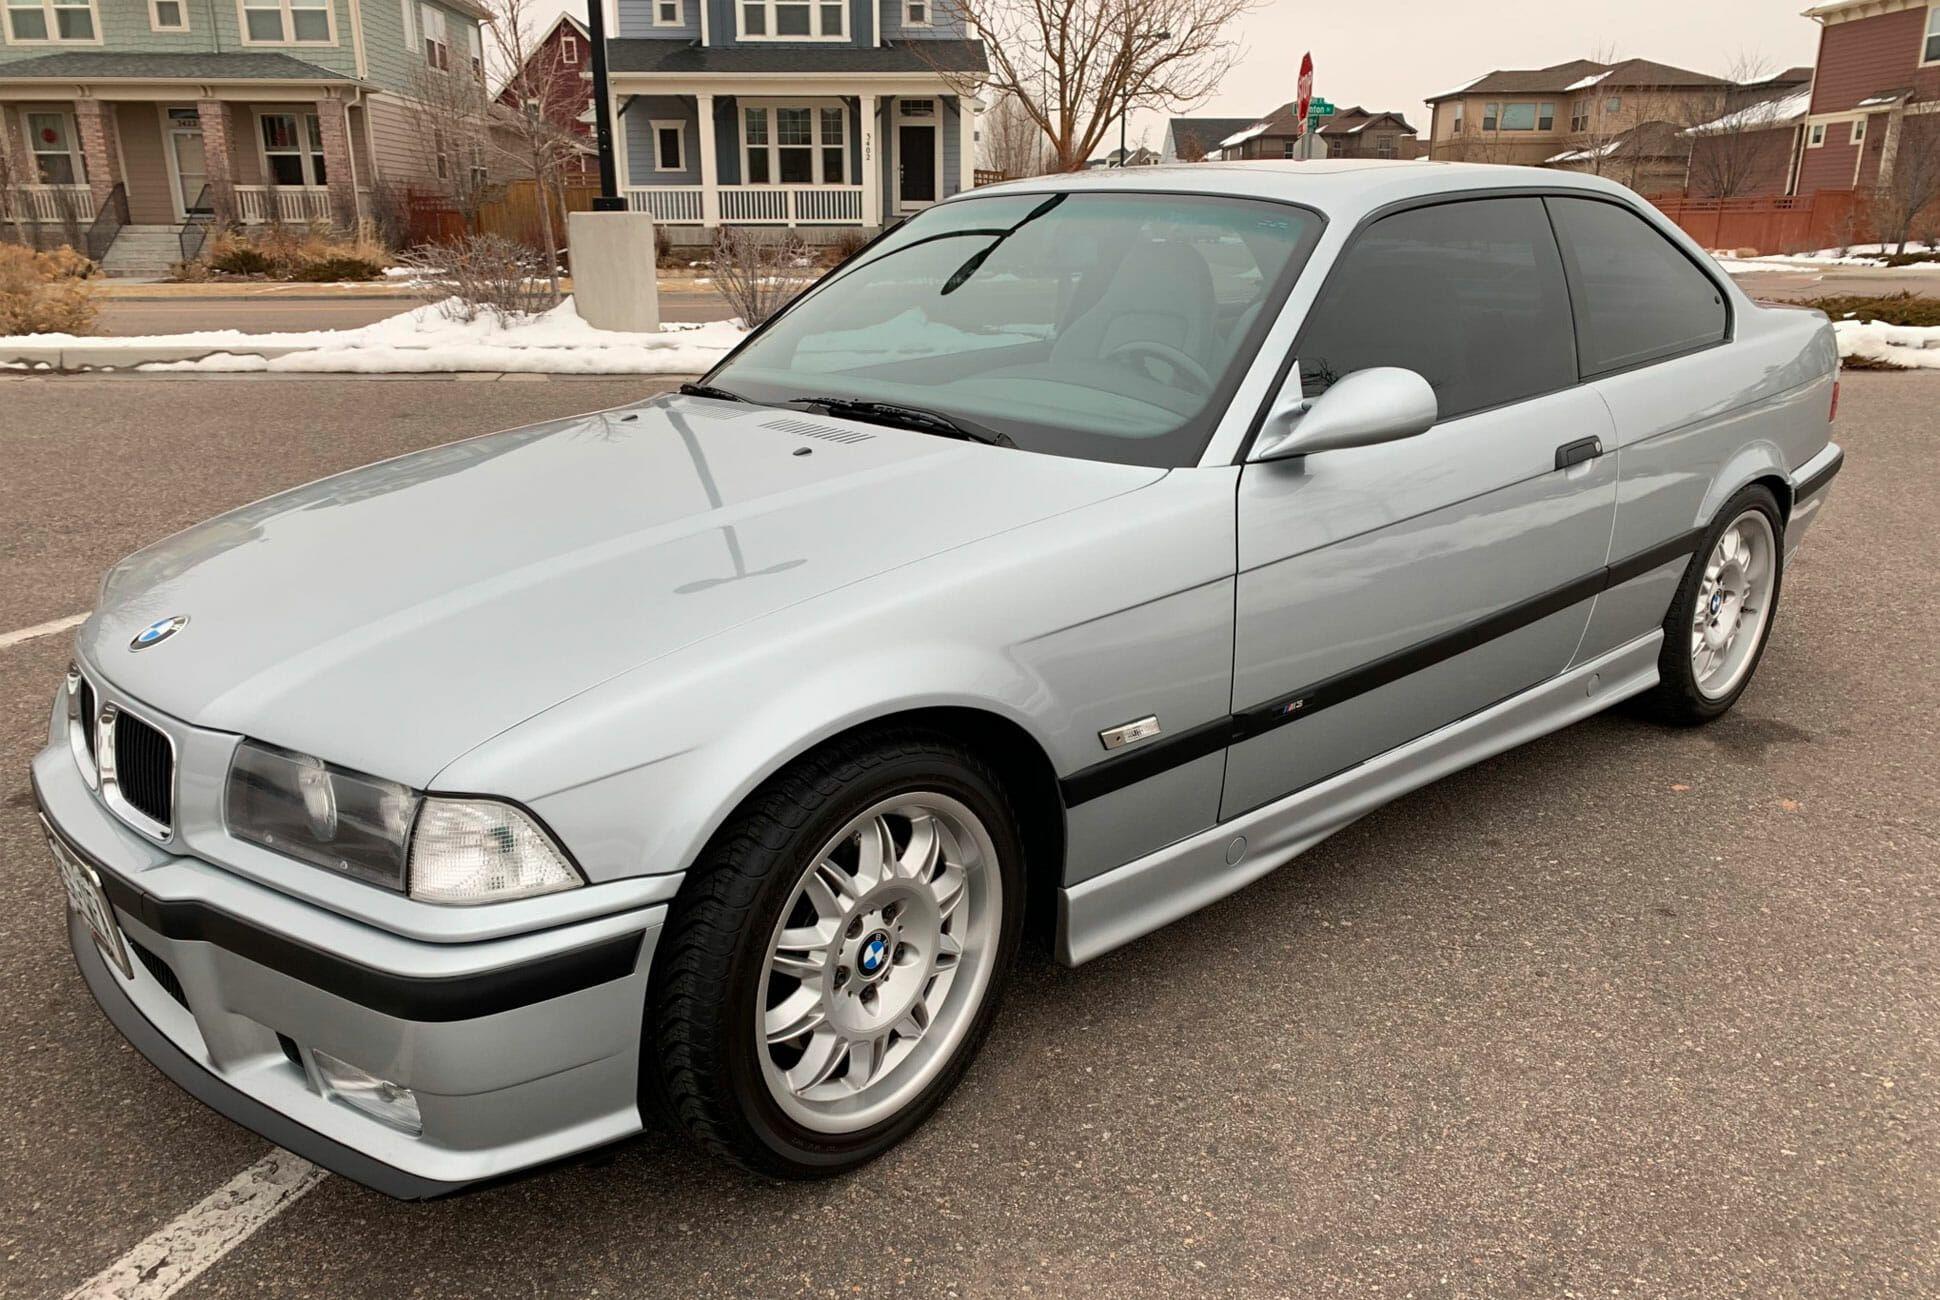 1996-BMW-M3-Coupe-5-Speed-gear-patrol-slide-01